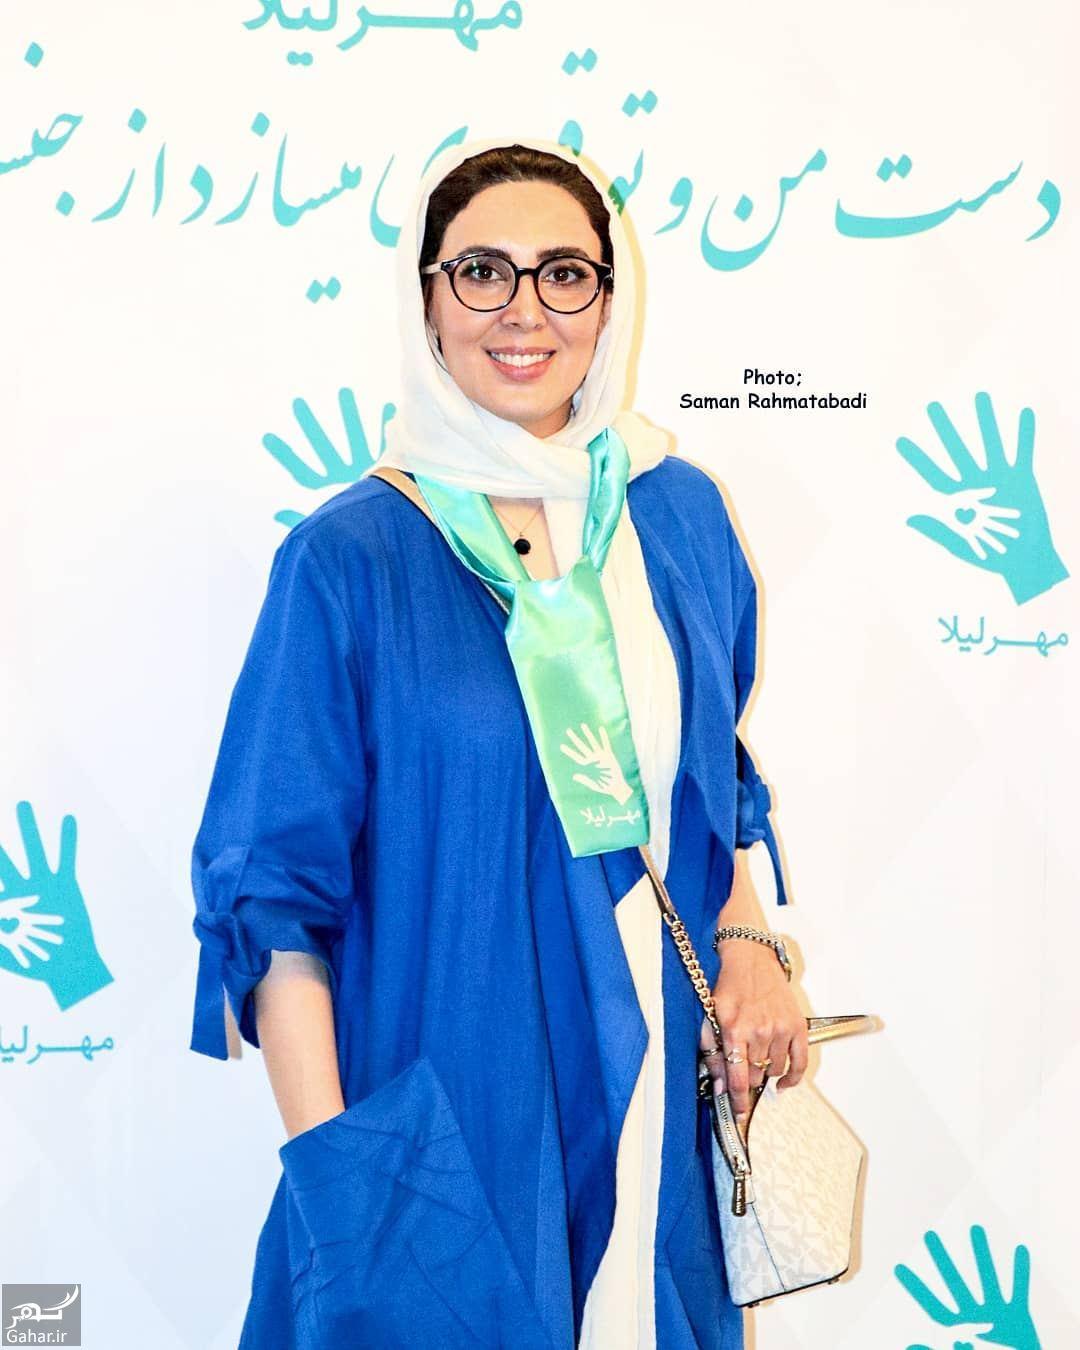 905331 Gahar ir عکسهای جدید بازیگران در ضیافت خیریه مهر لیلا